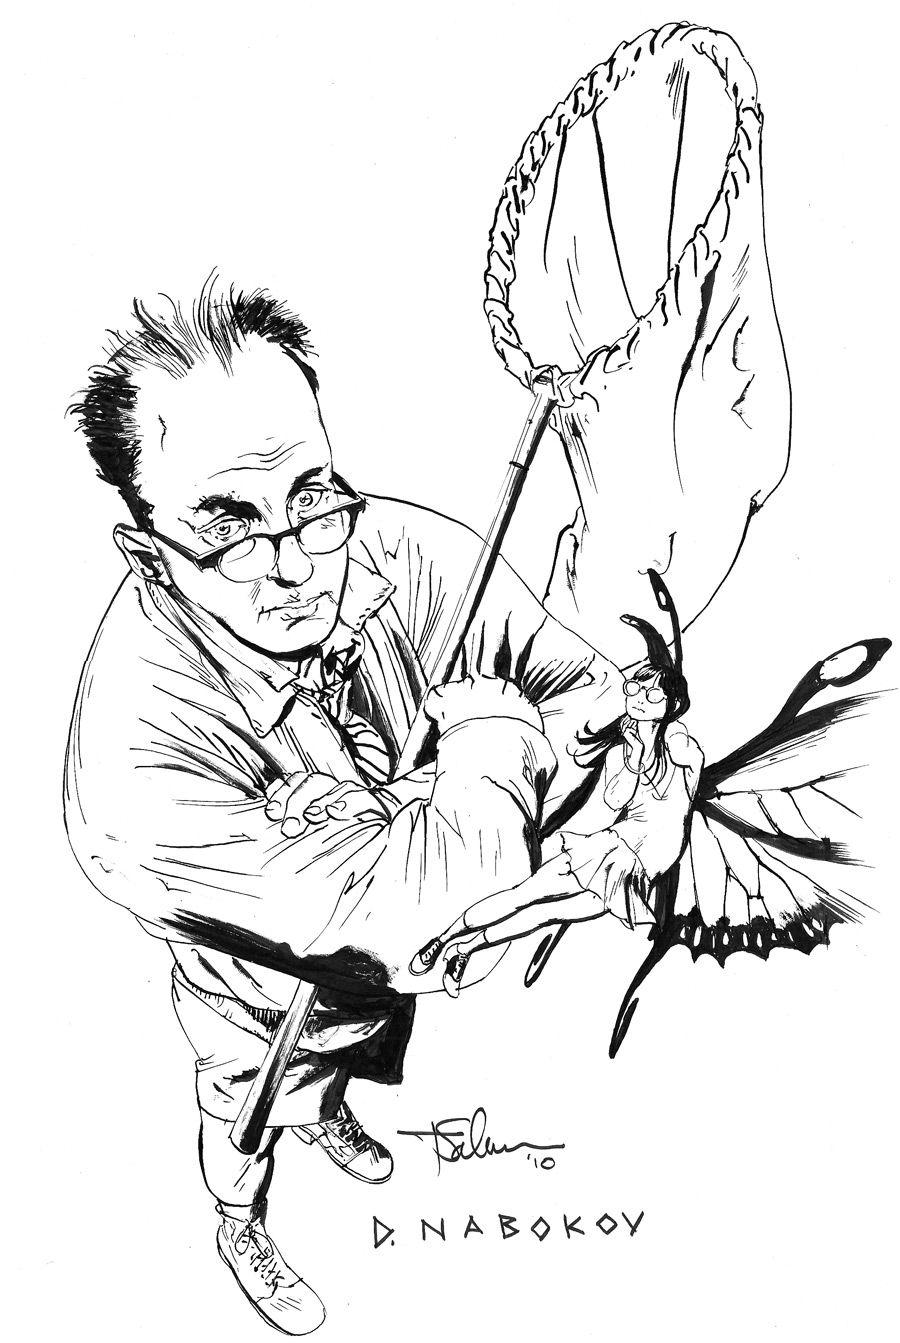 Плакат-портрет Владимира Набокова - дизайнер aix23